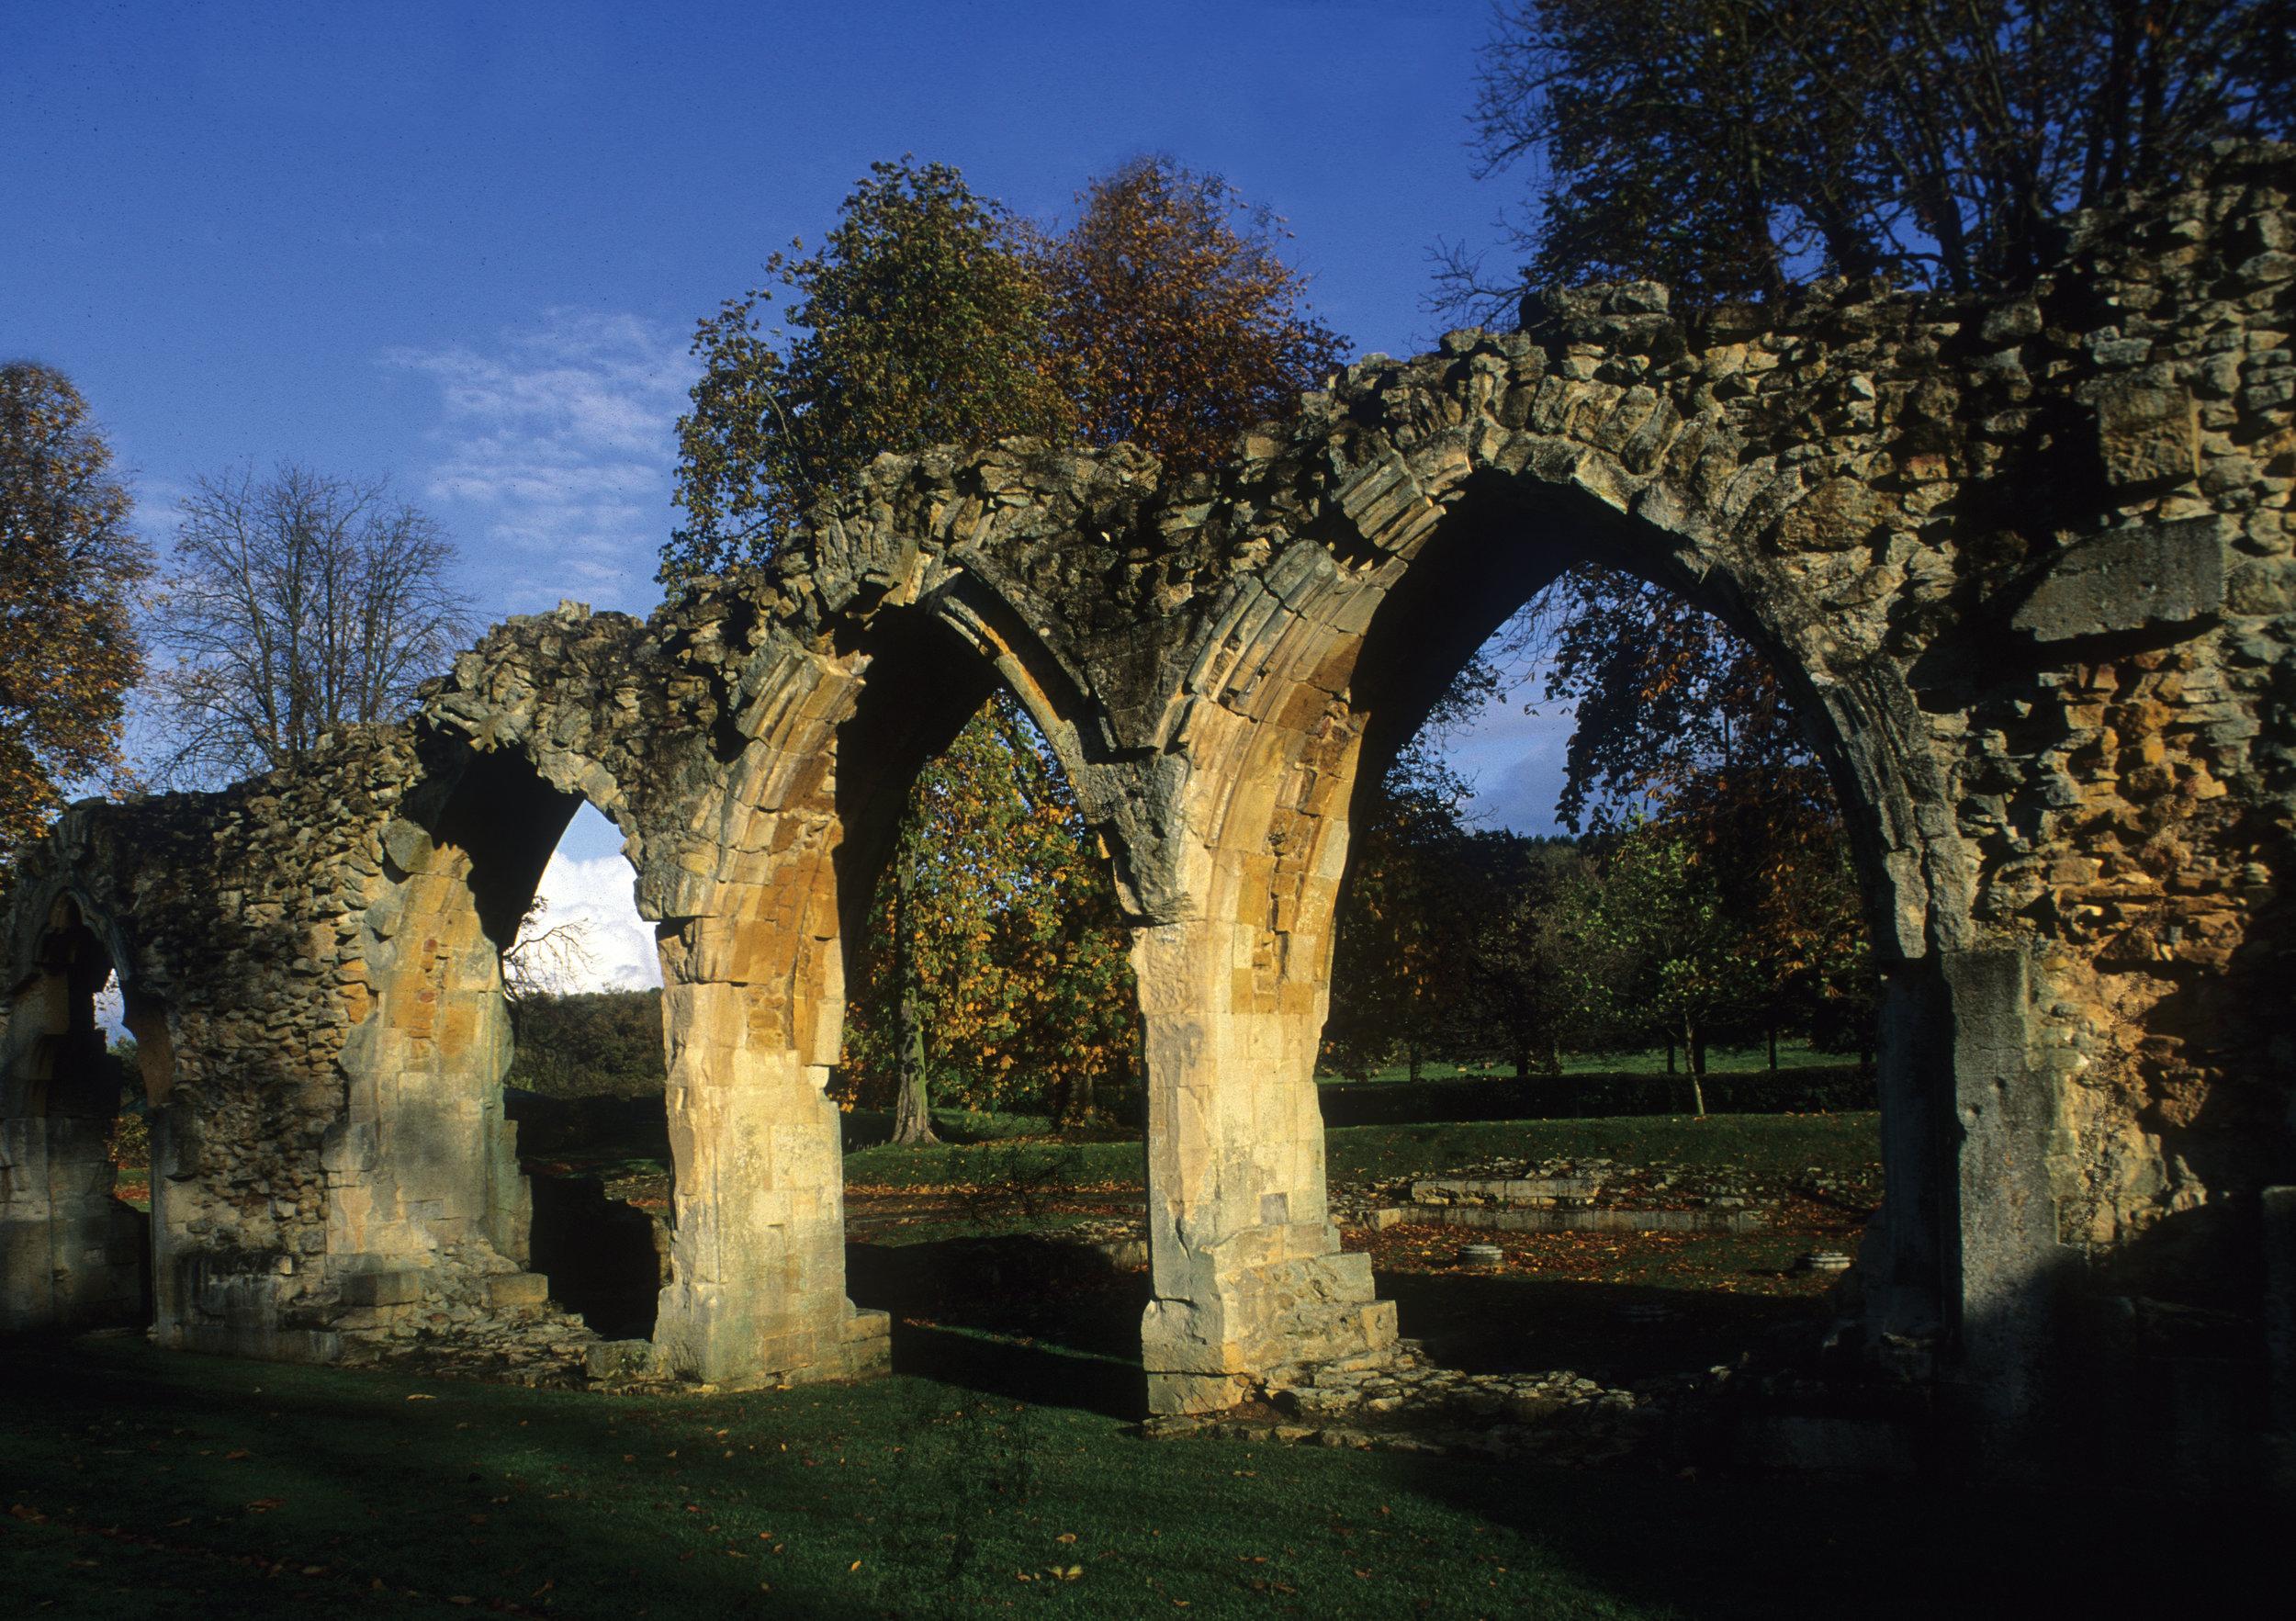 Hailes Abbey, Winc hcombe, Glos 01.jpg